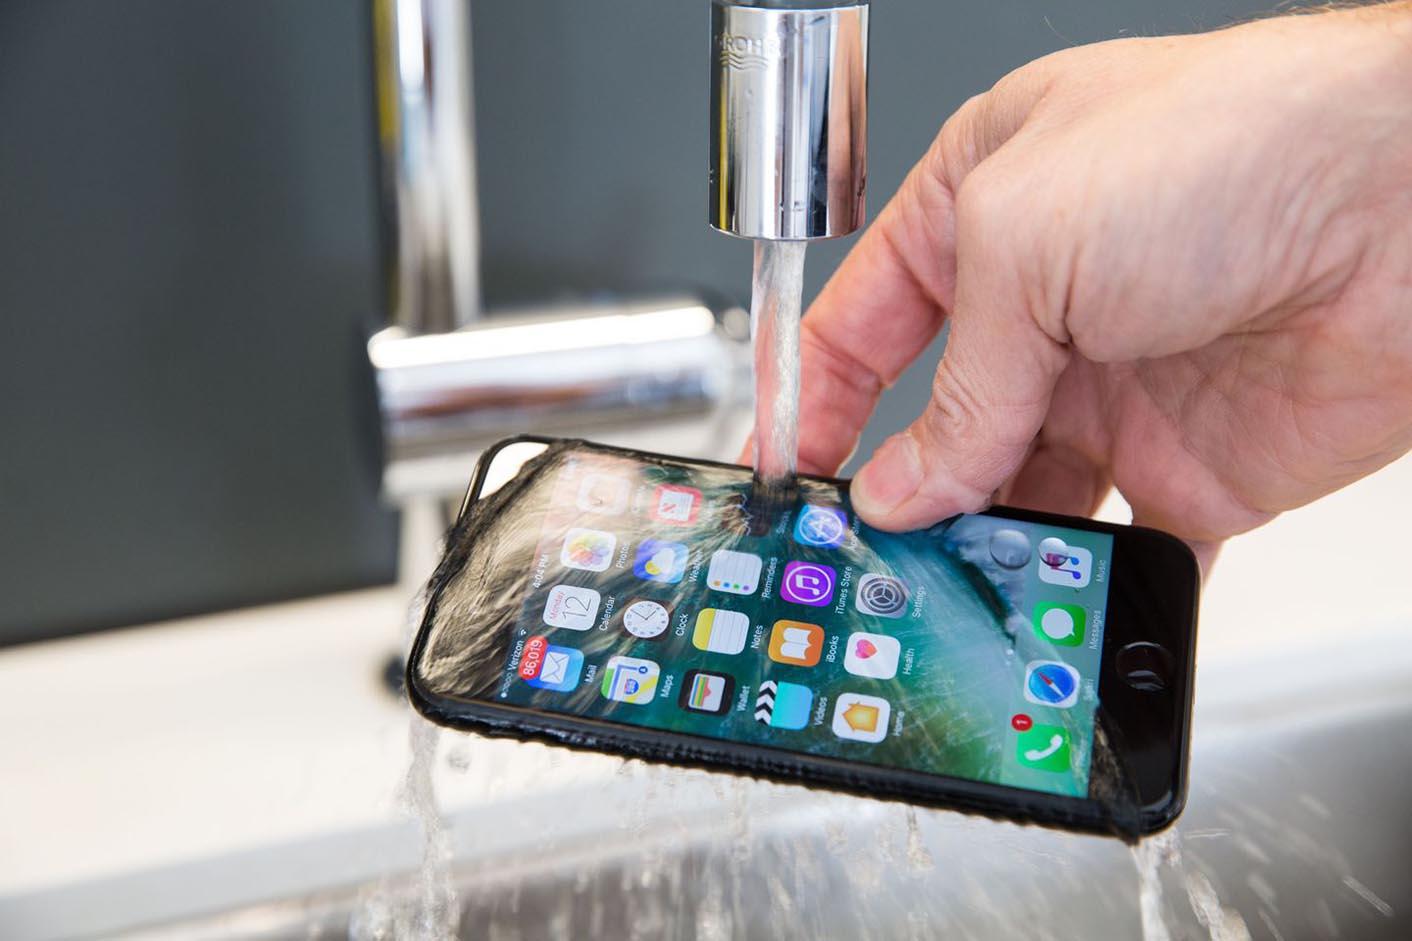 iPhone 7 étanchéité